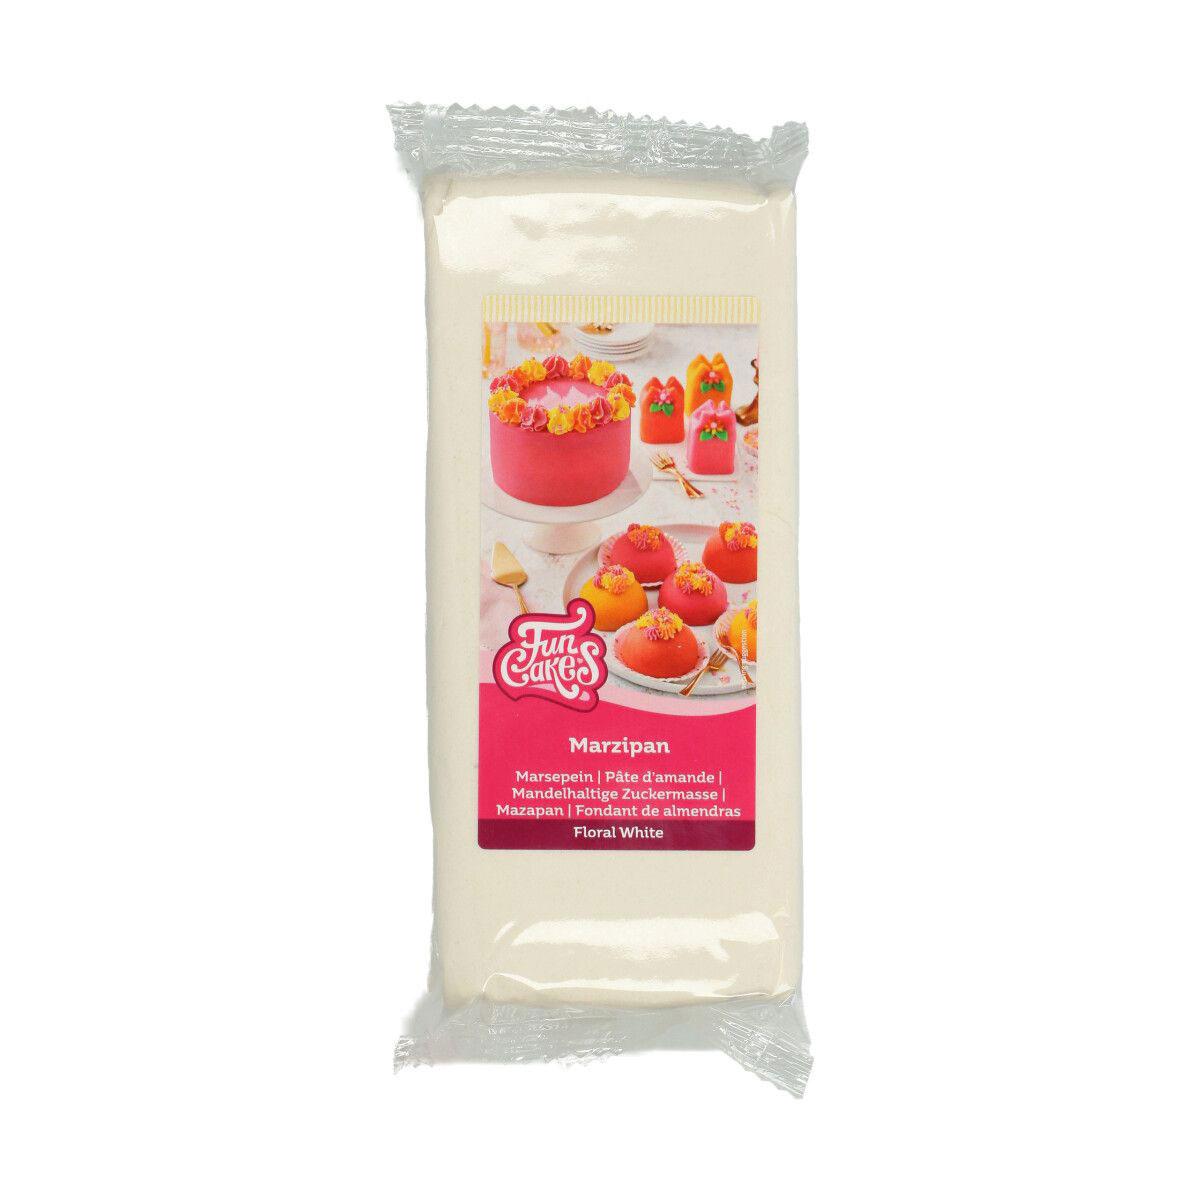 Funcakes mandelhaltige Zuckermasse - Marzipan Weiss 1 Kg